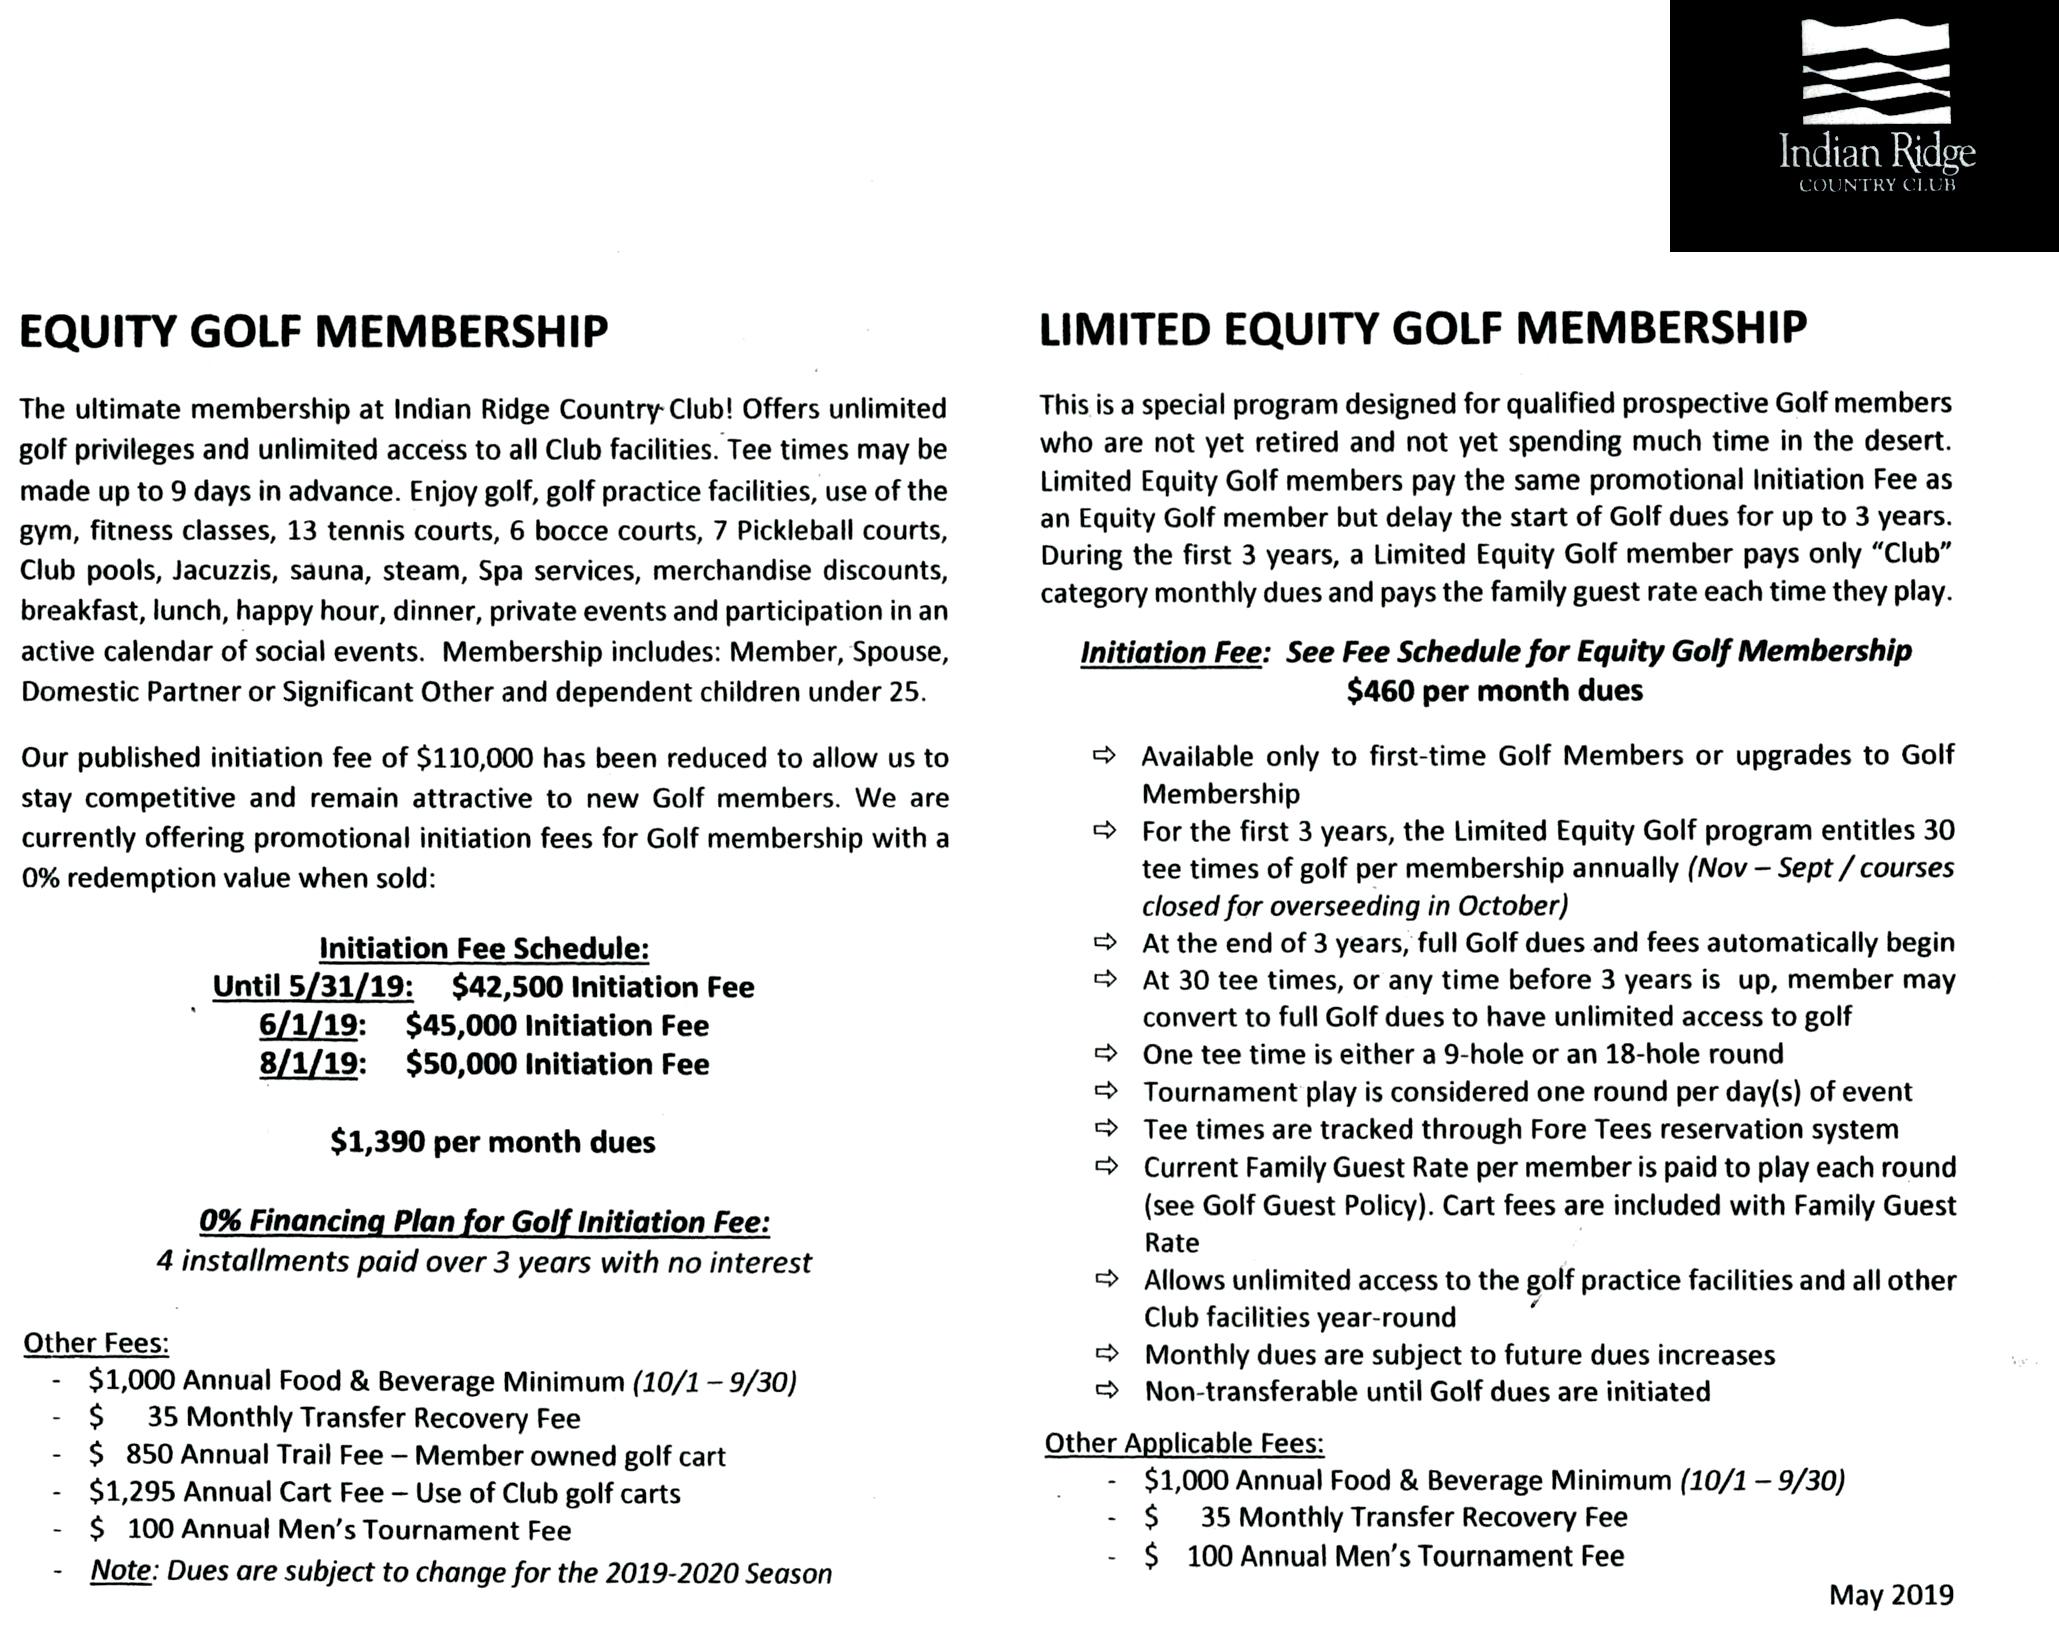 IRCC Golf Equity Membership